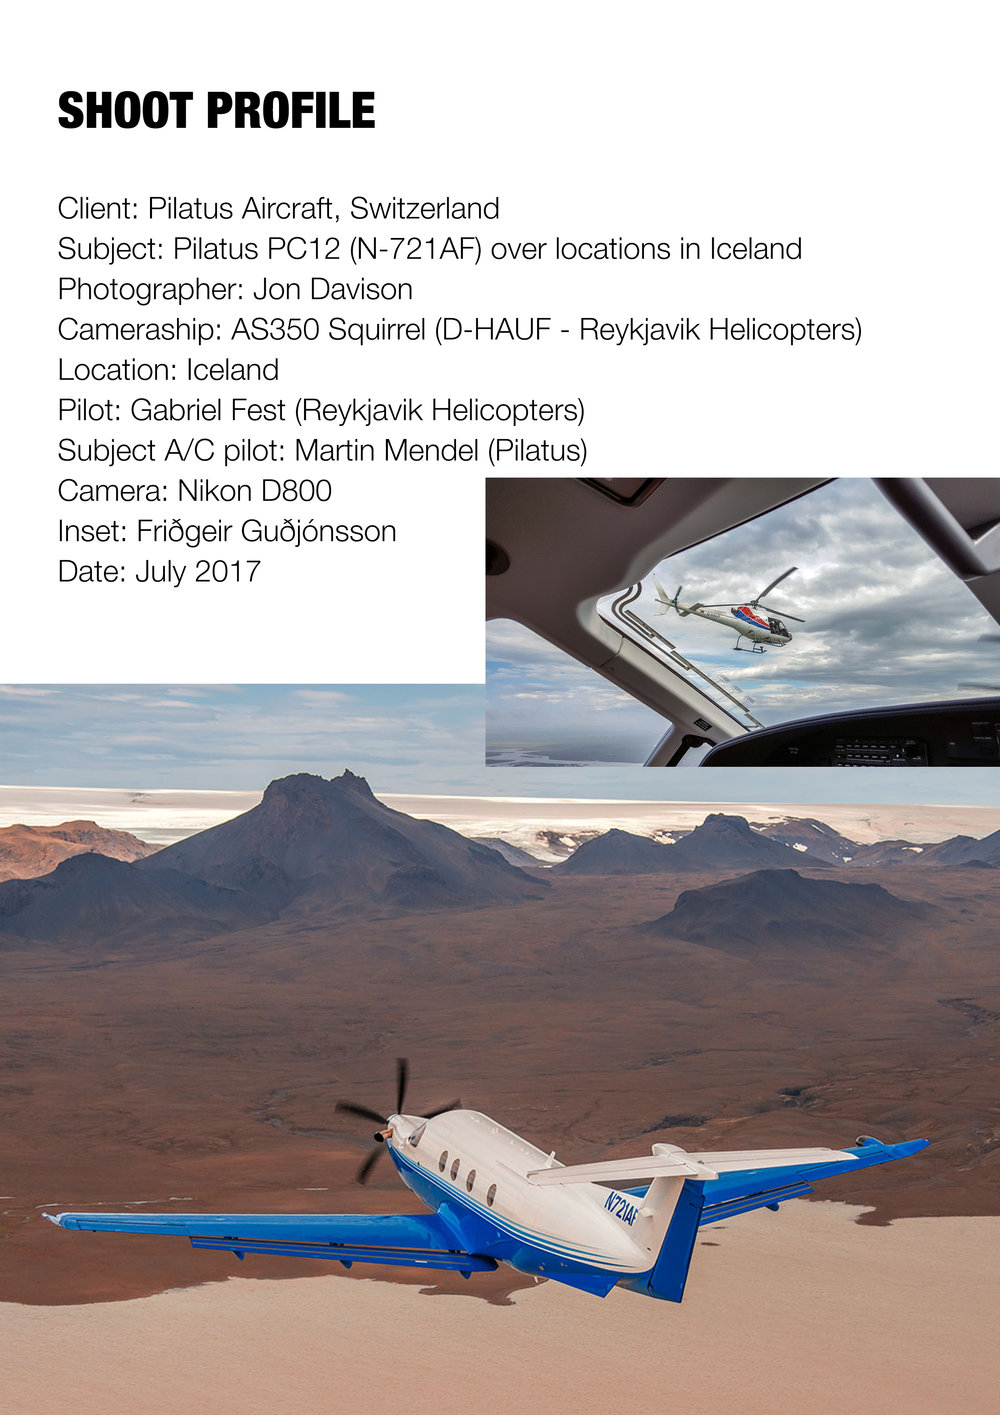 Pilatus PC12, Iceland